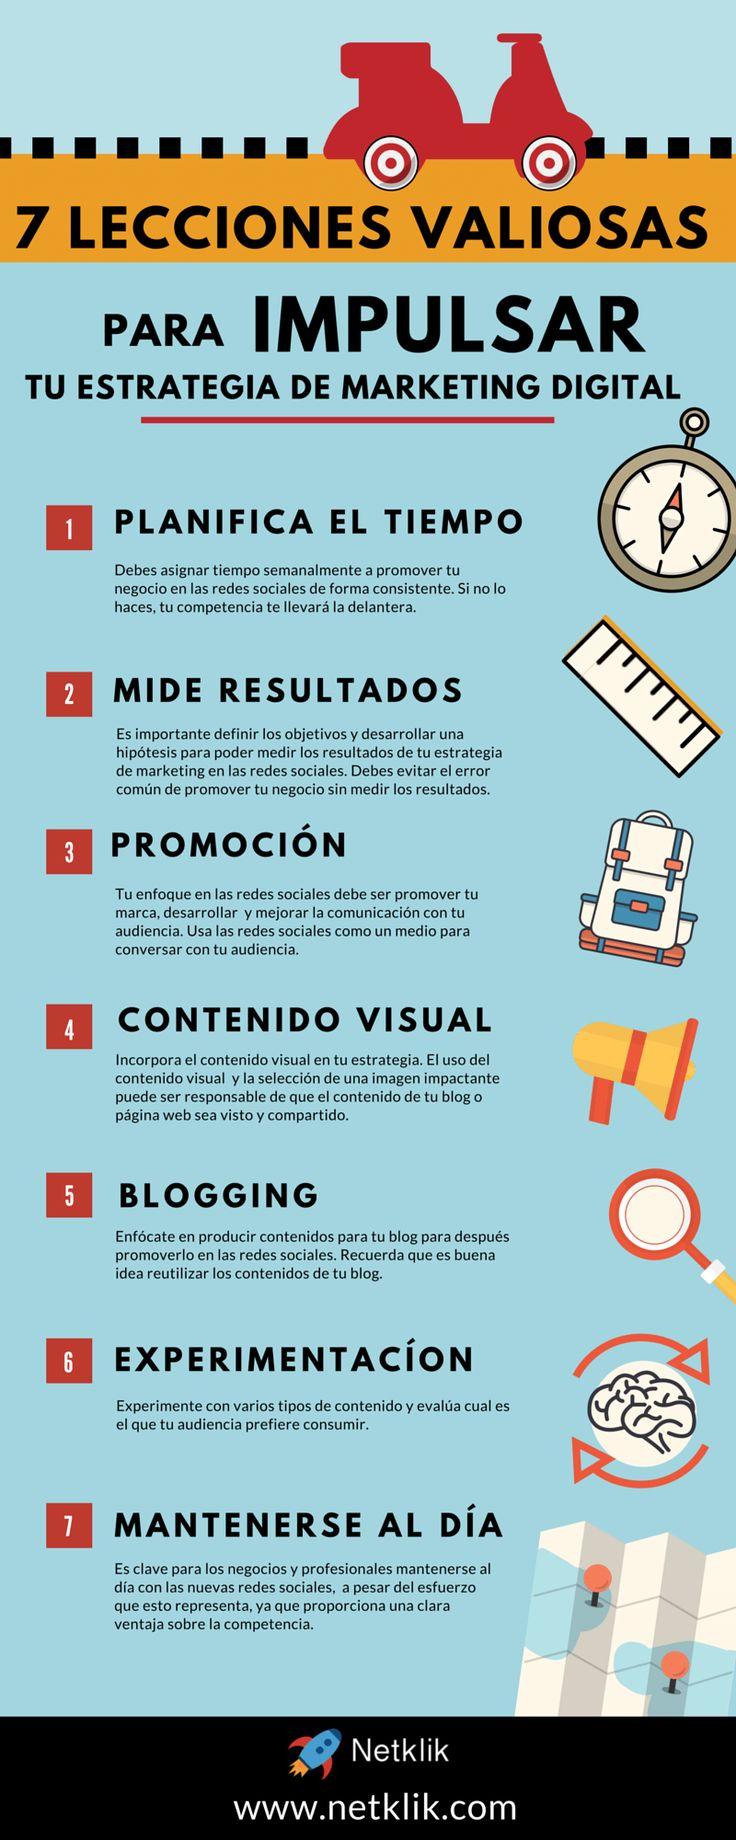 Descubre las 7 lecciones para impulsar tu estrategia de marketing digital #infografia #estrategiamarketingdigital #infographic